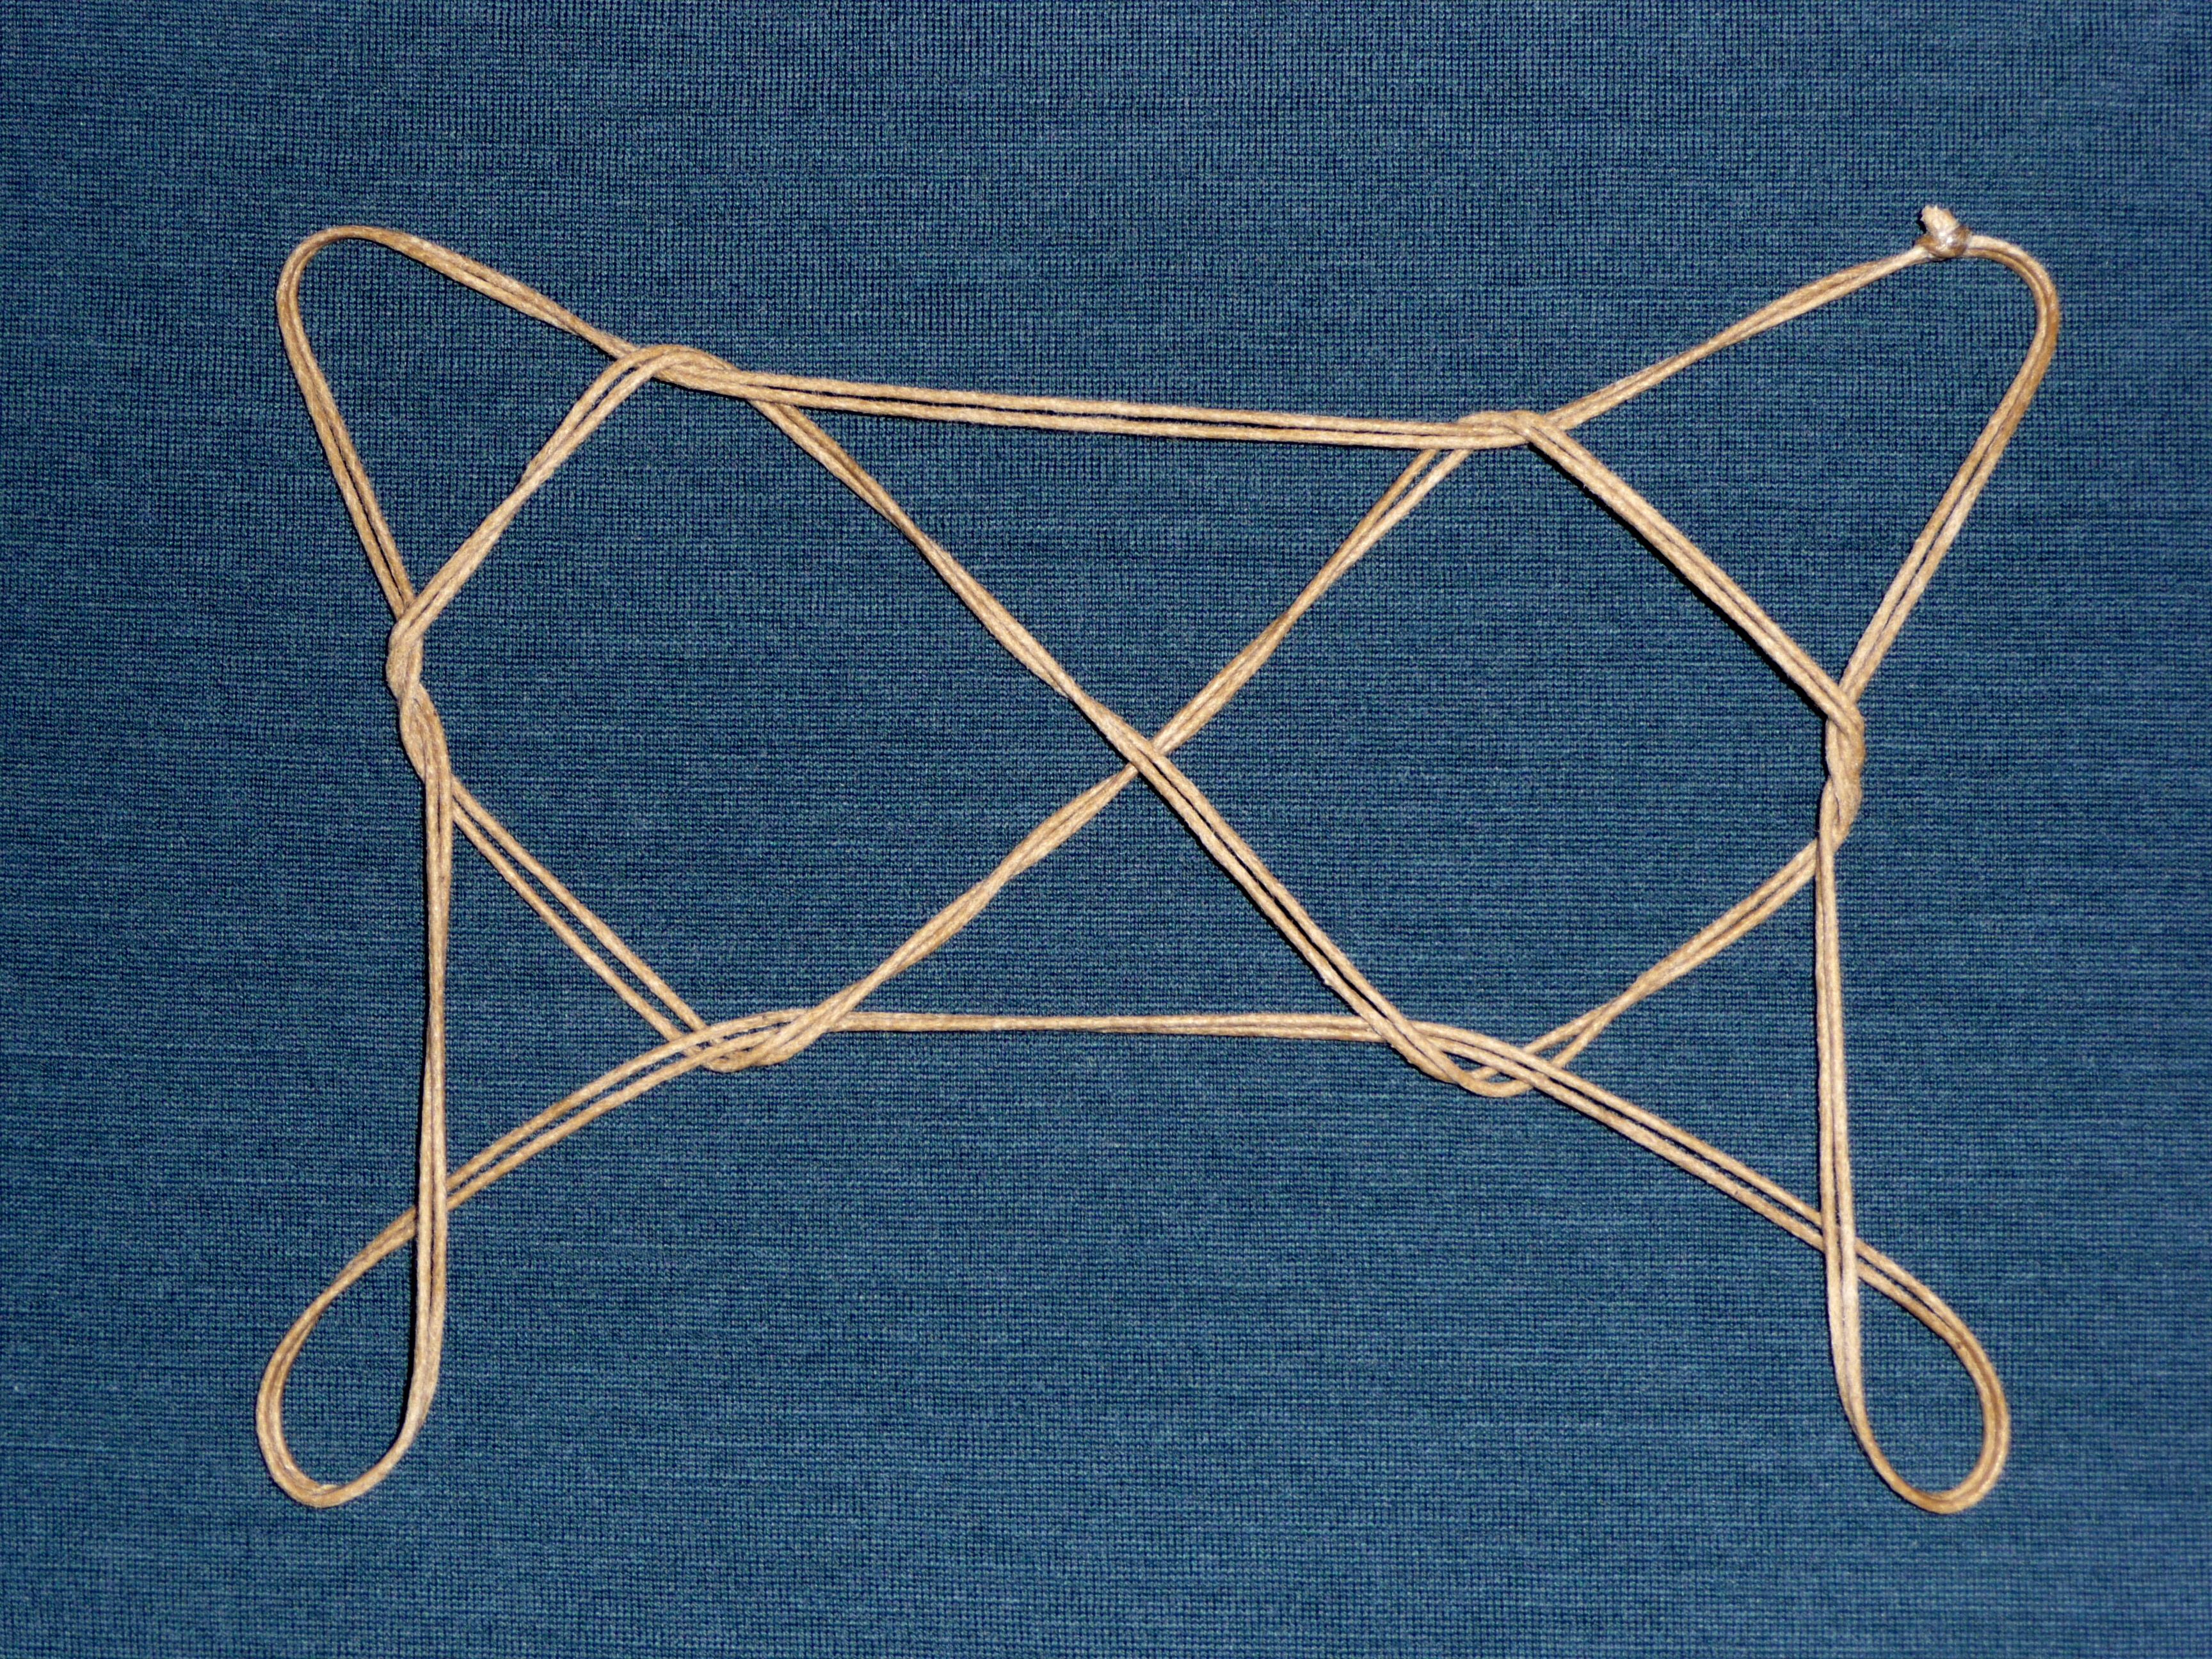 String figure - Wikipedia